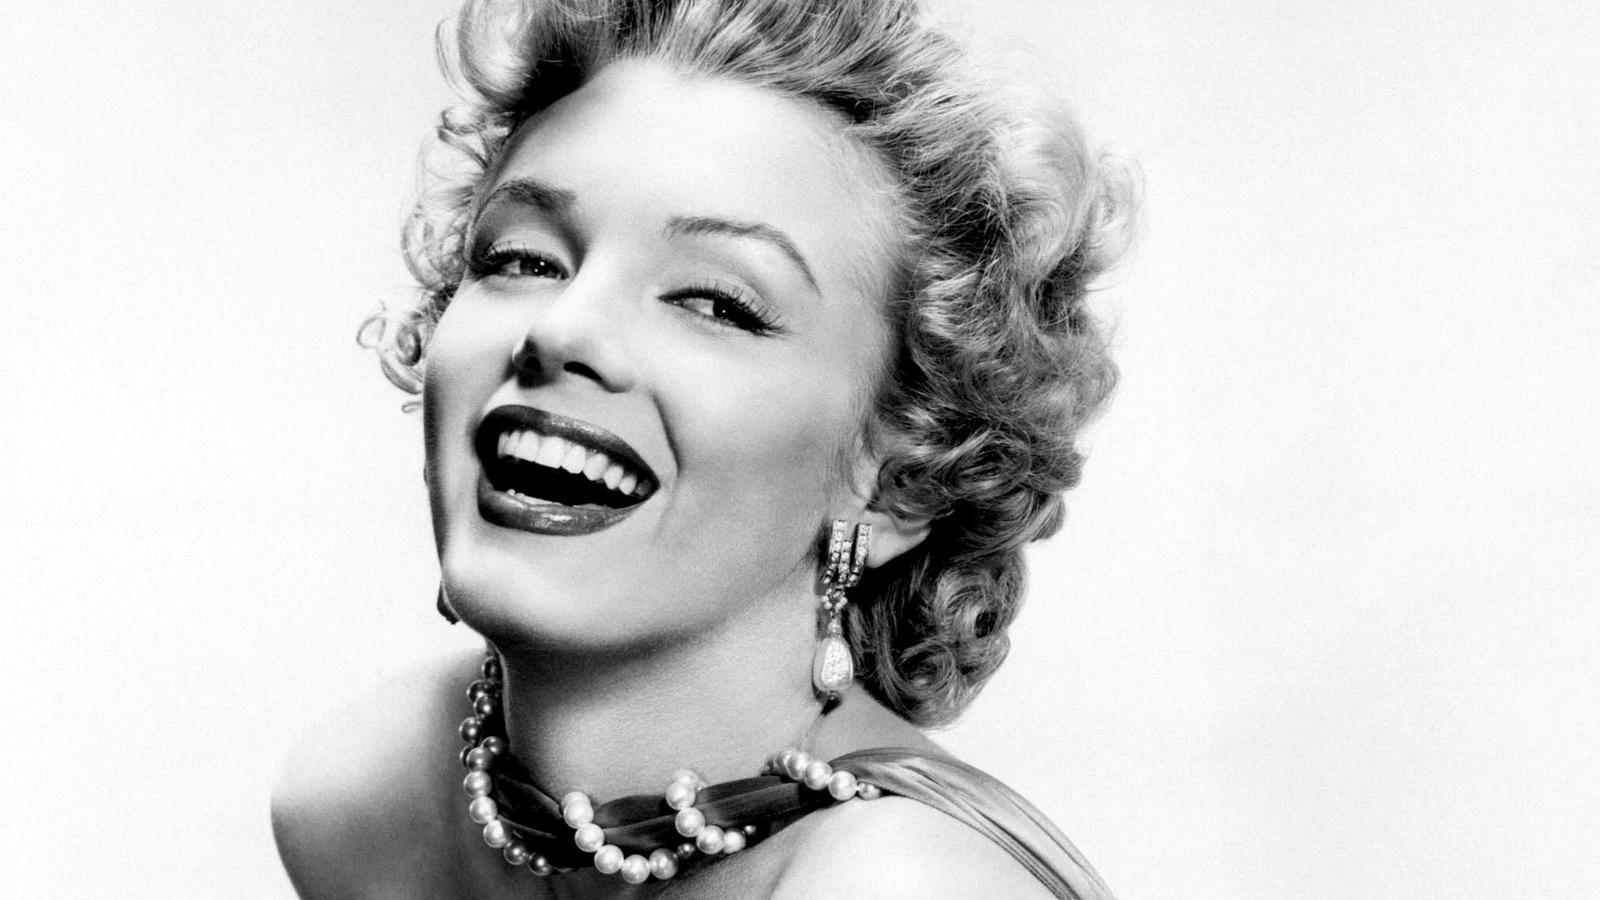 ᗕChicas Sexy Marilyn Monroe Marilyn Monroe Laugh blanco y negro ...